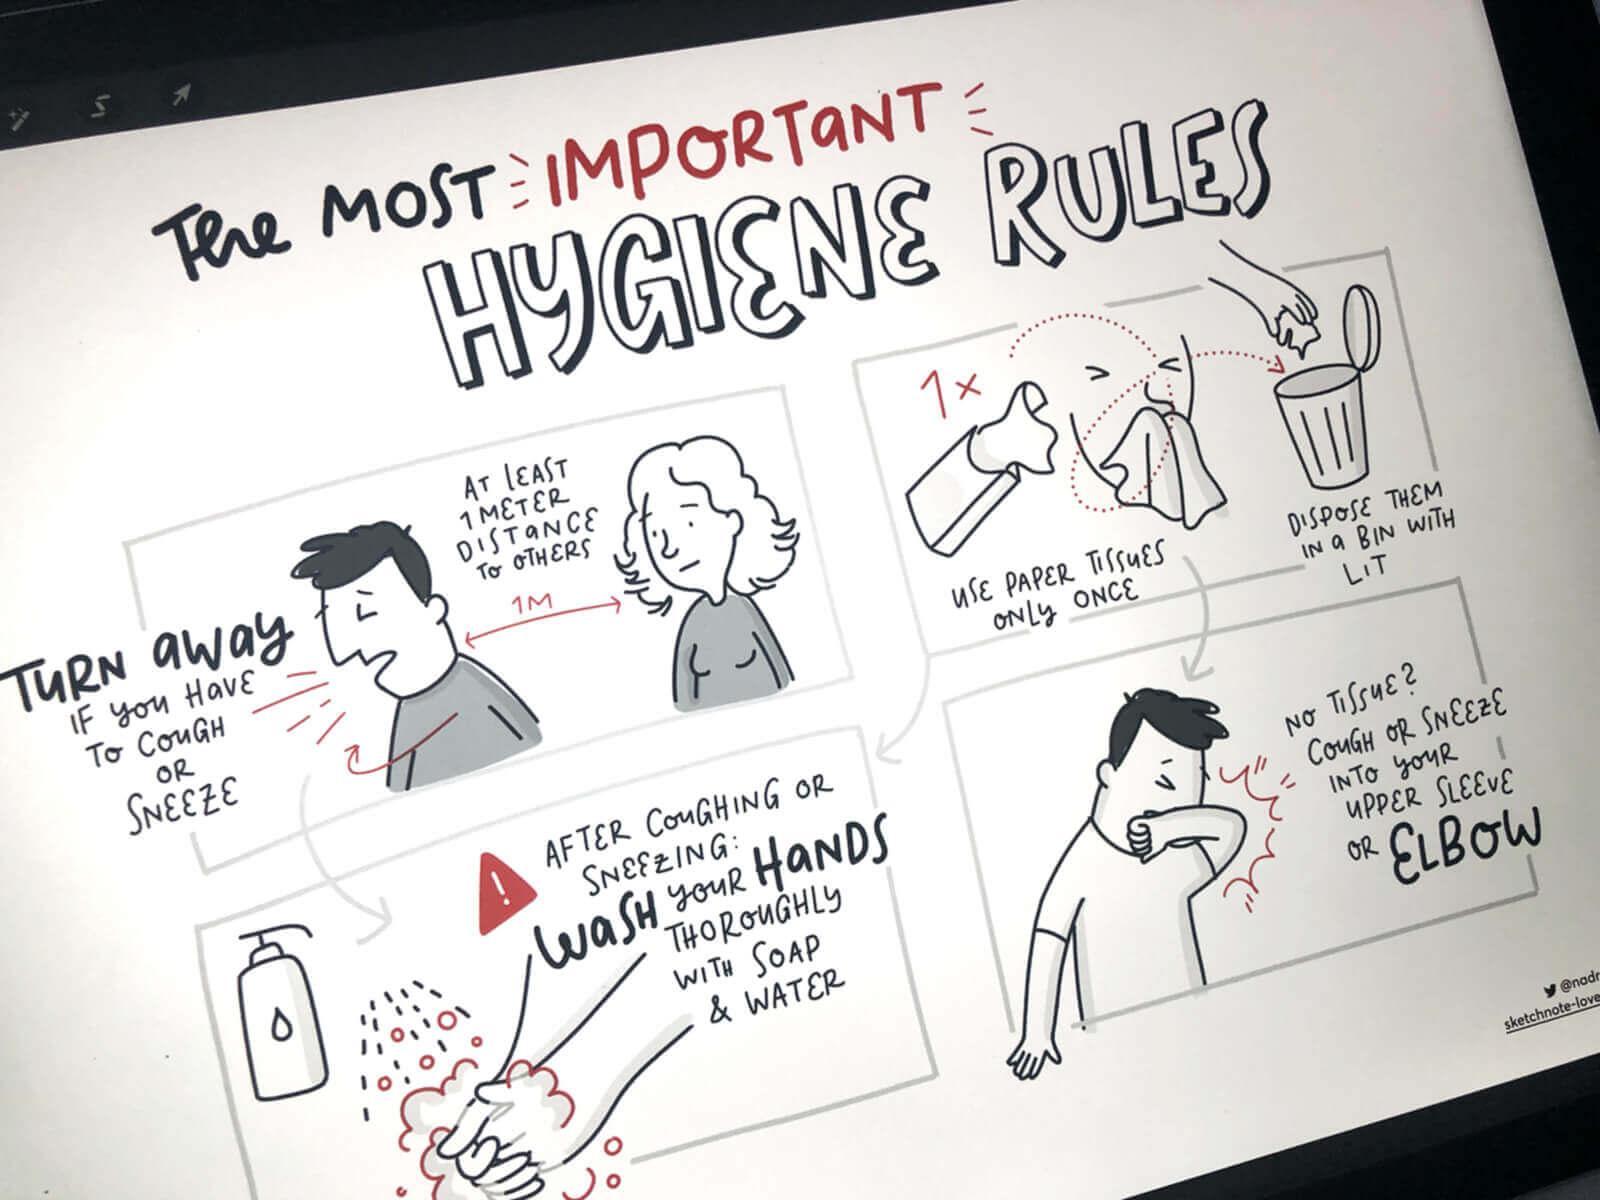 Sketchnotes Hygiene Rules